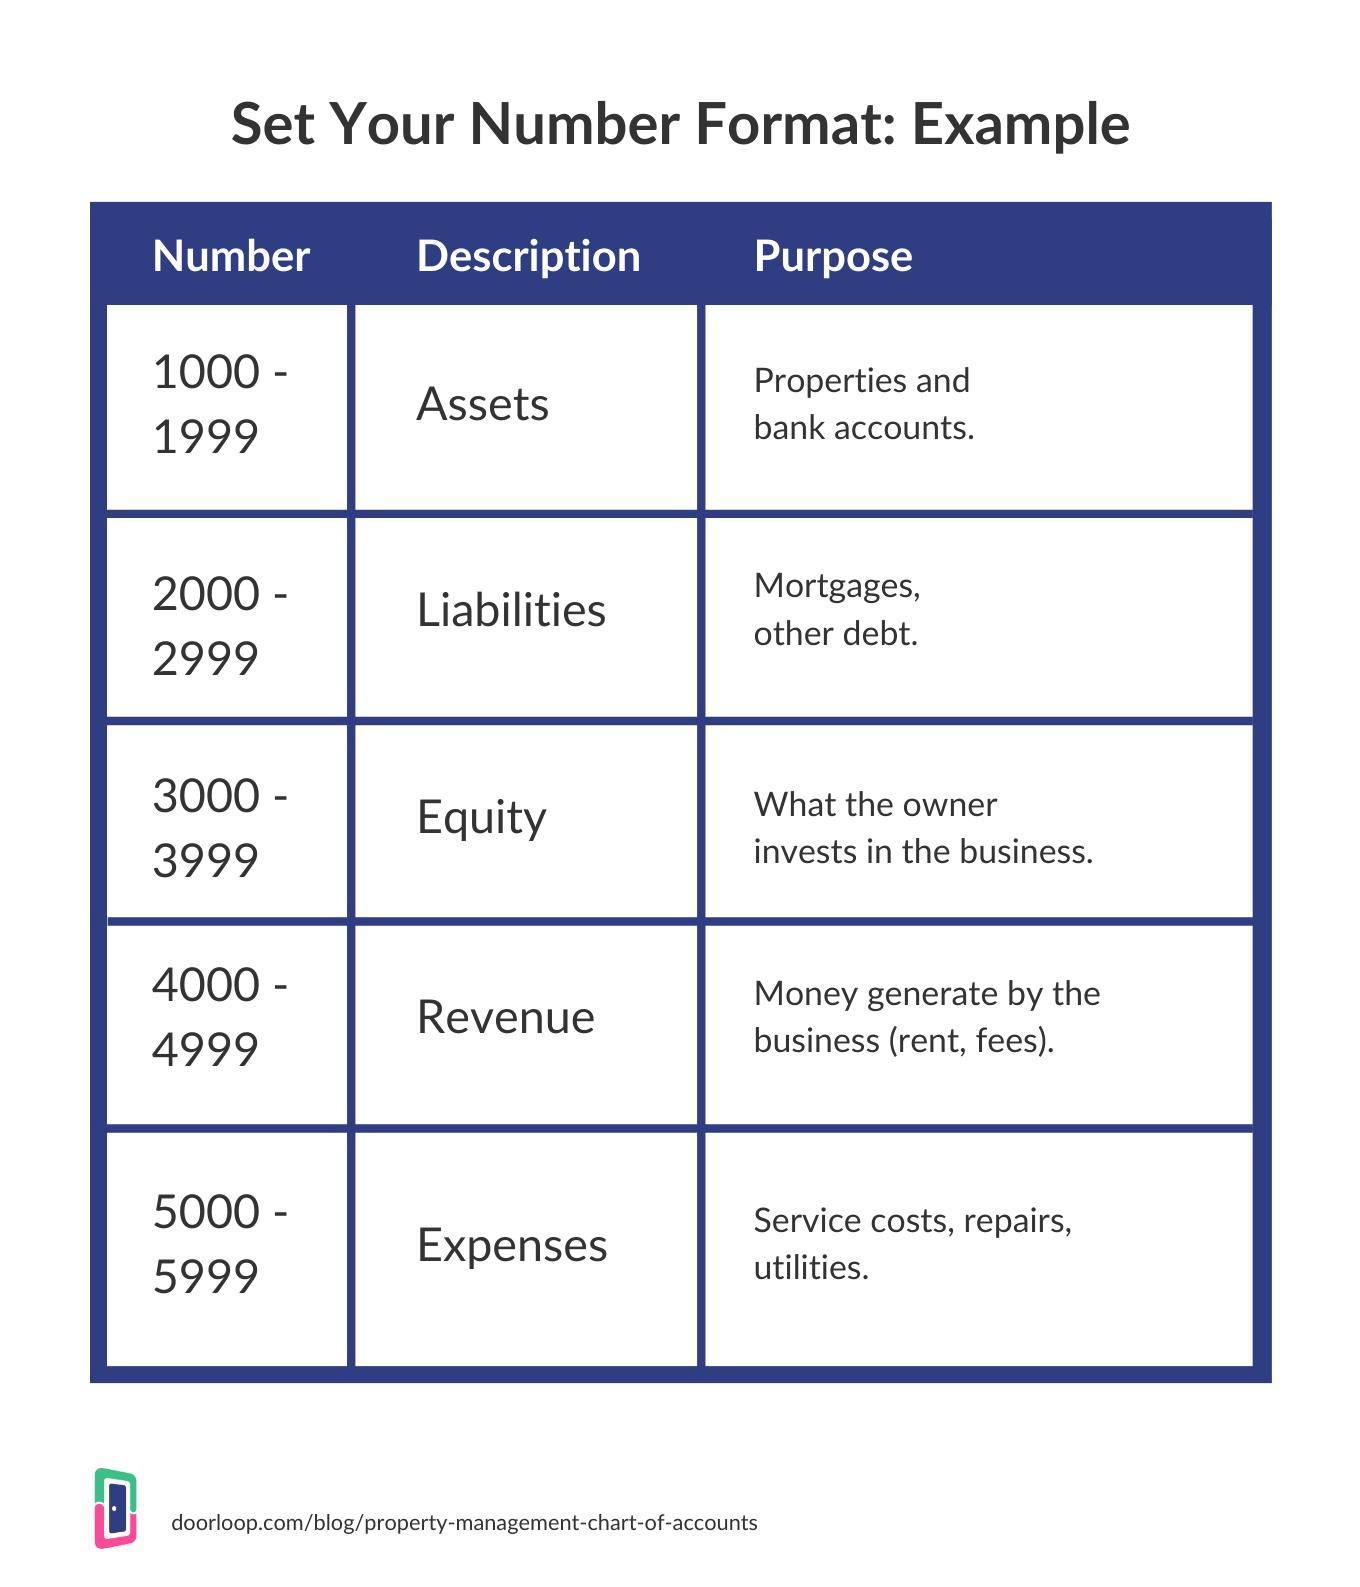 Set your number format